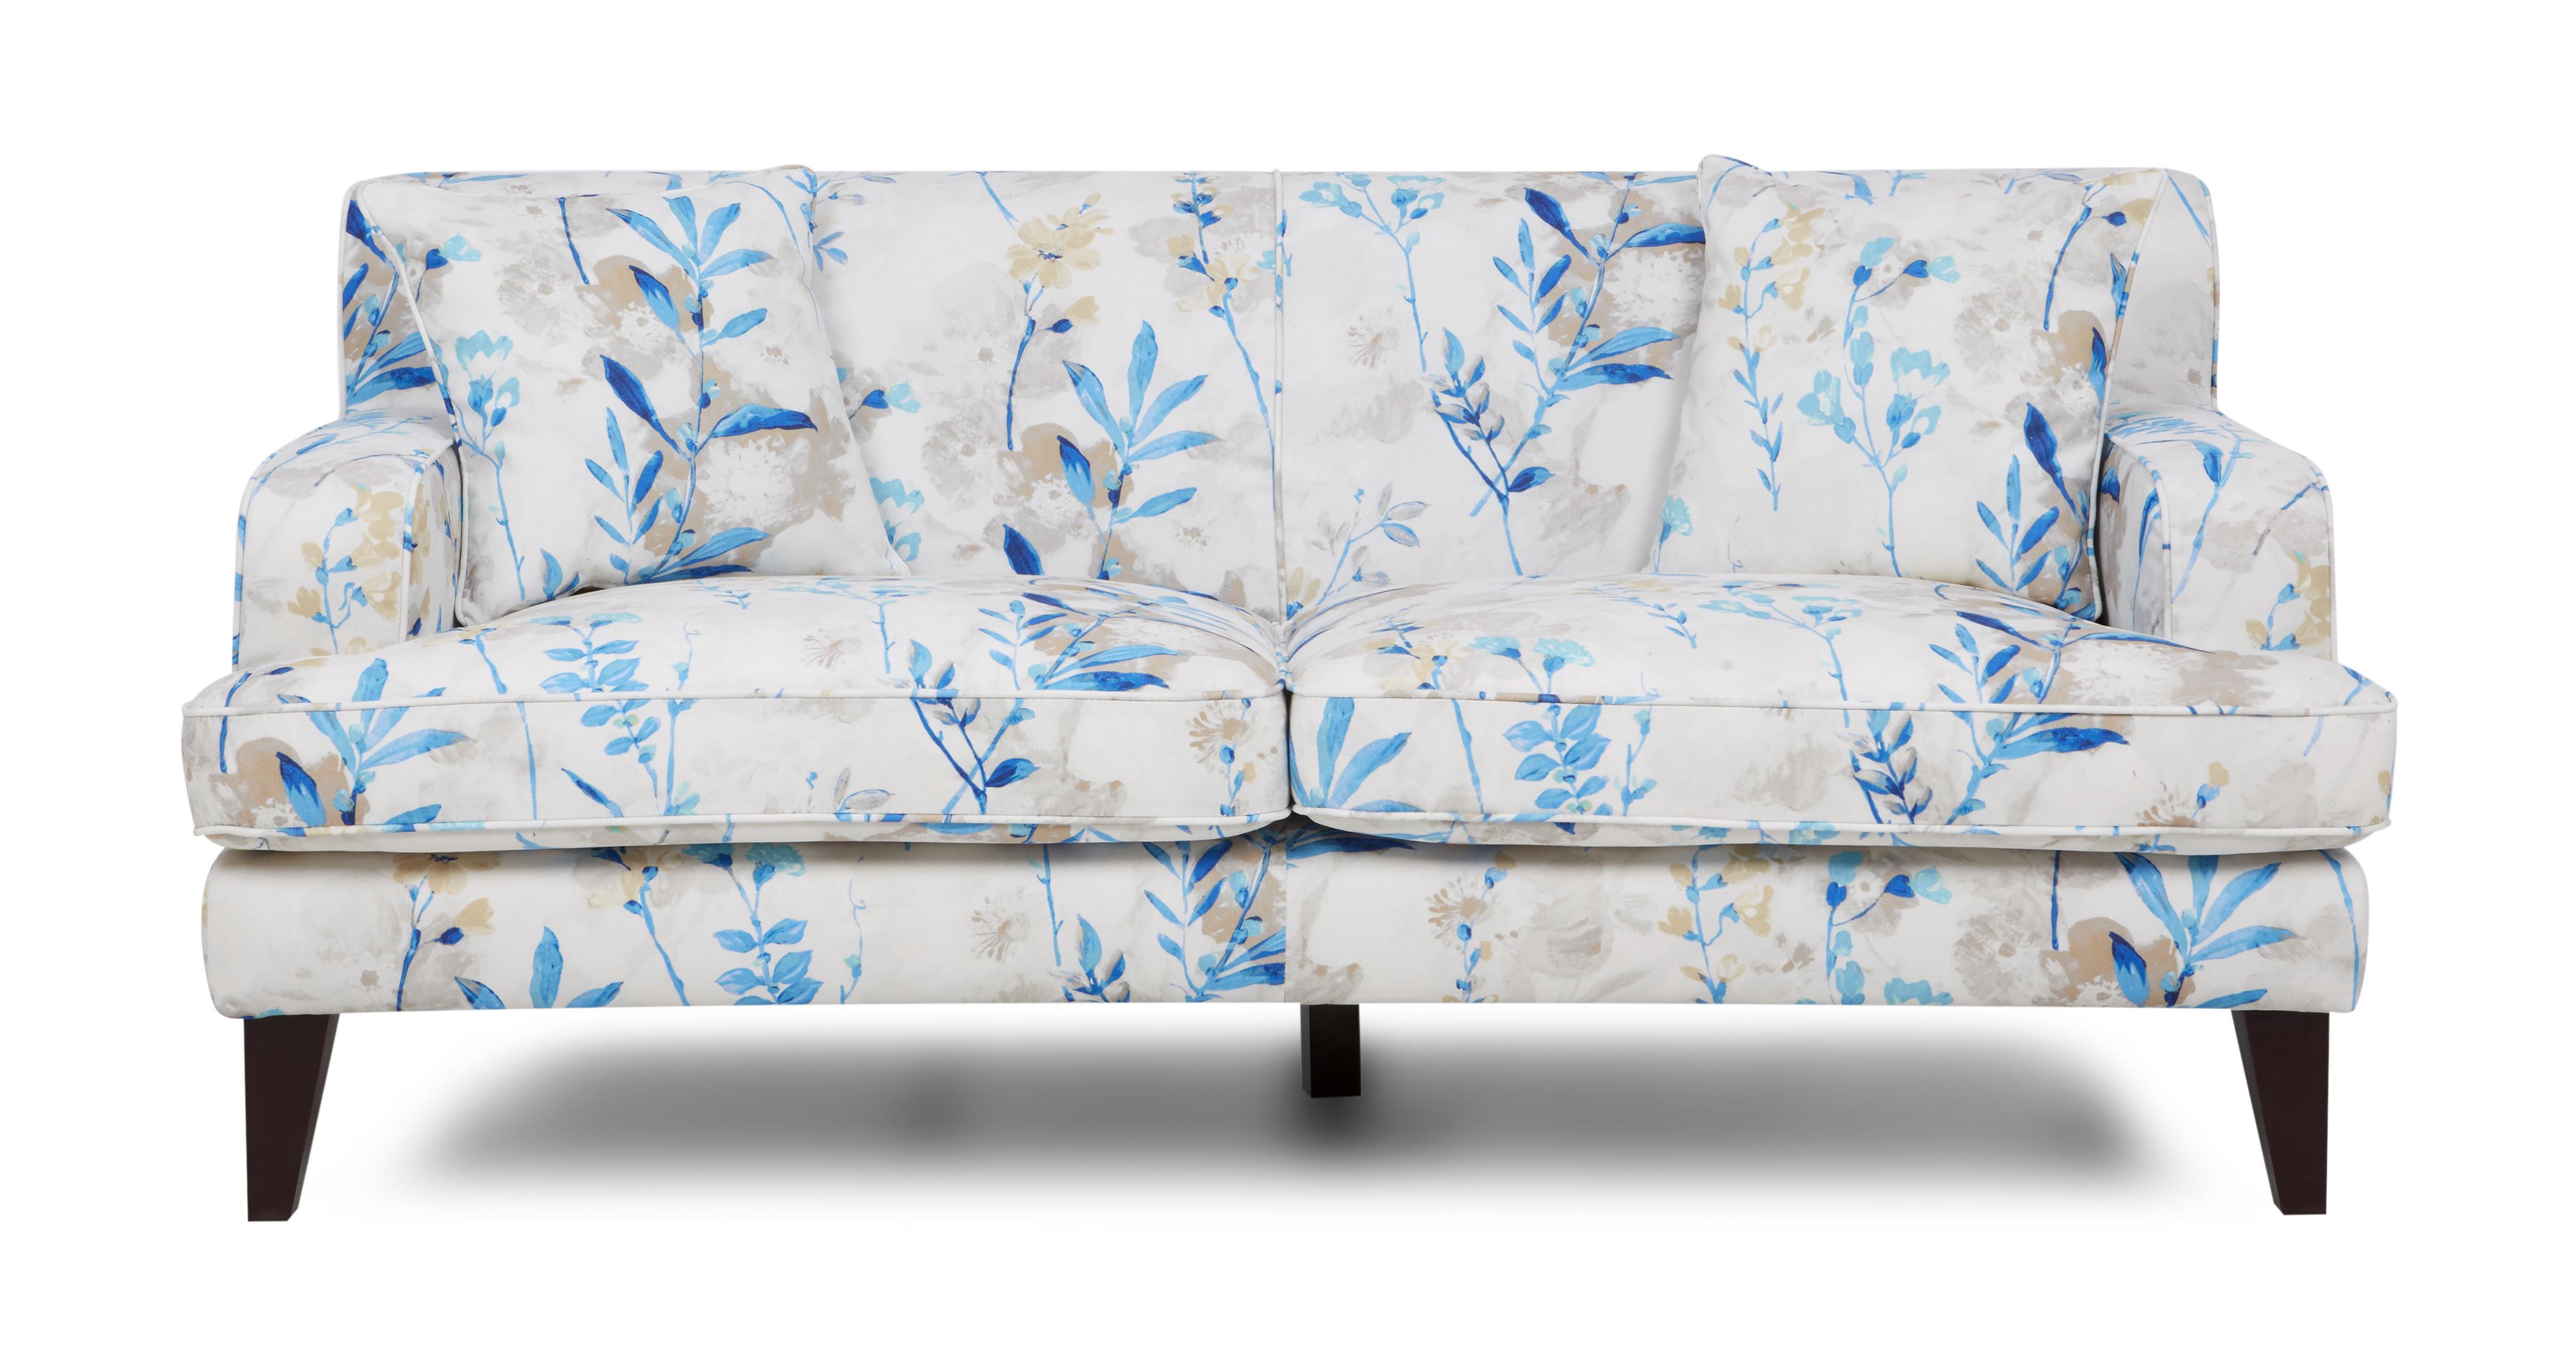 Floral Sofa penelope floral 3 seater sofa penelope floral | dfs